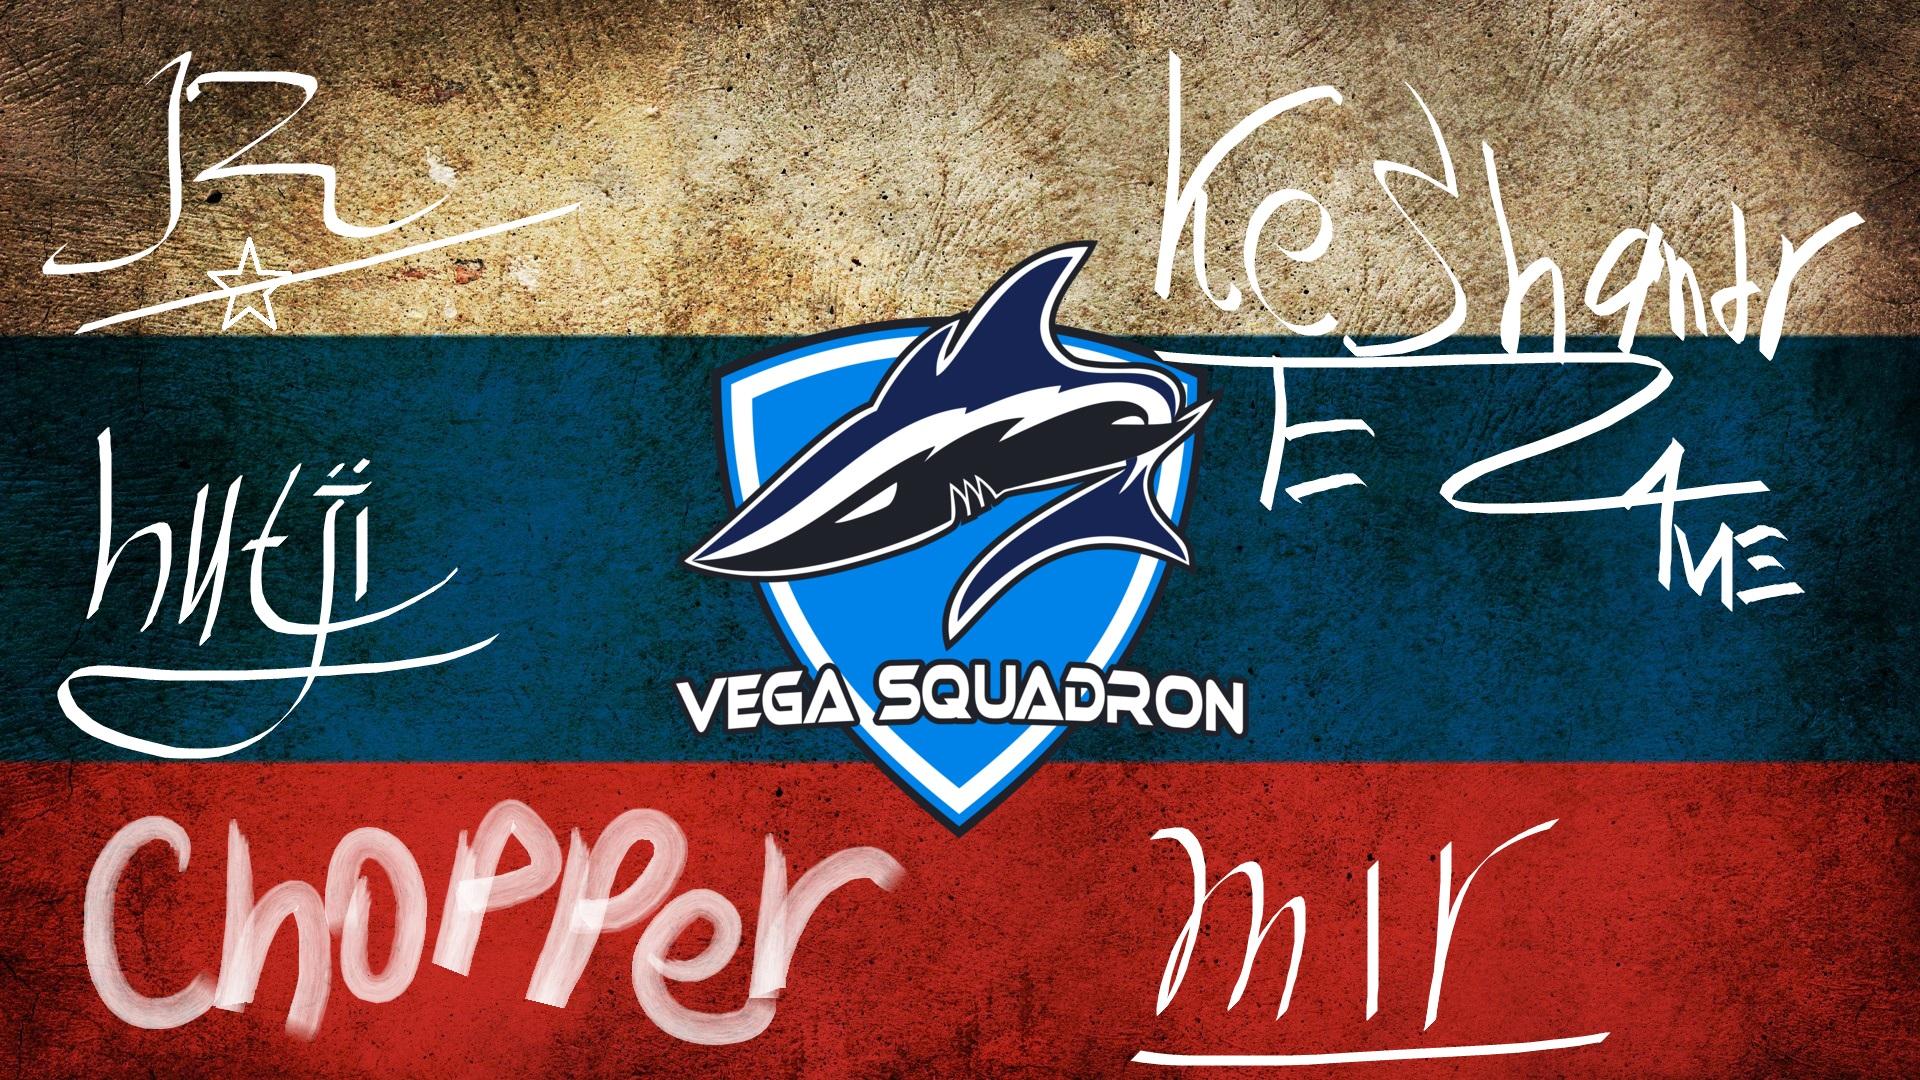 Autograph Vega Squadron - from Ronofar